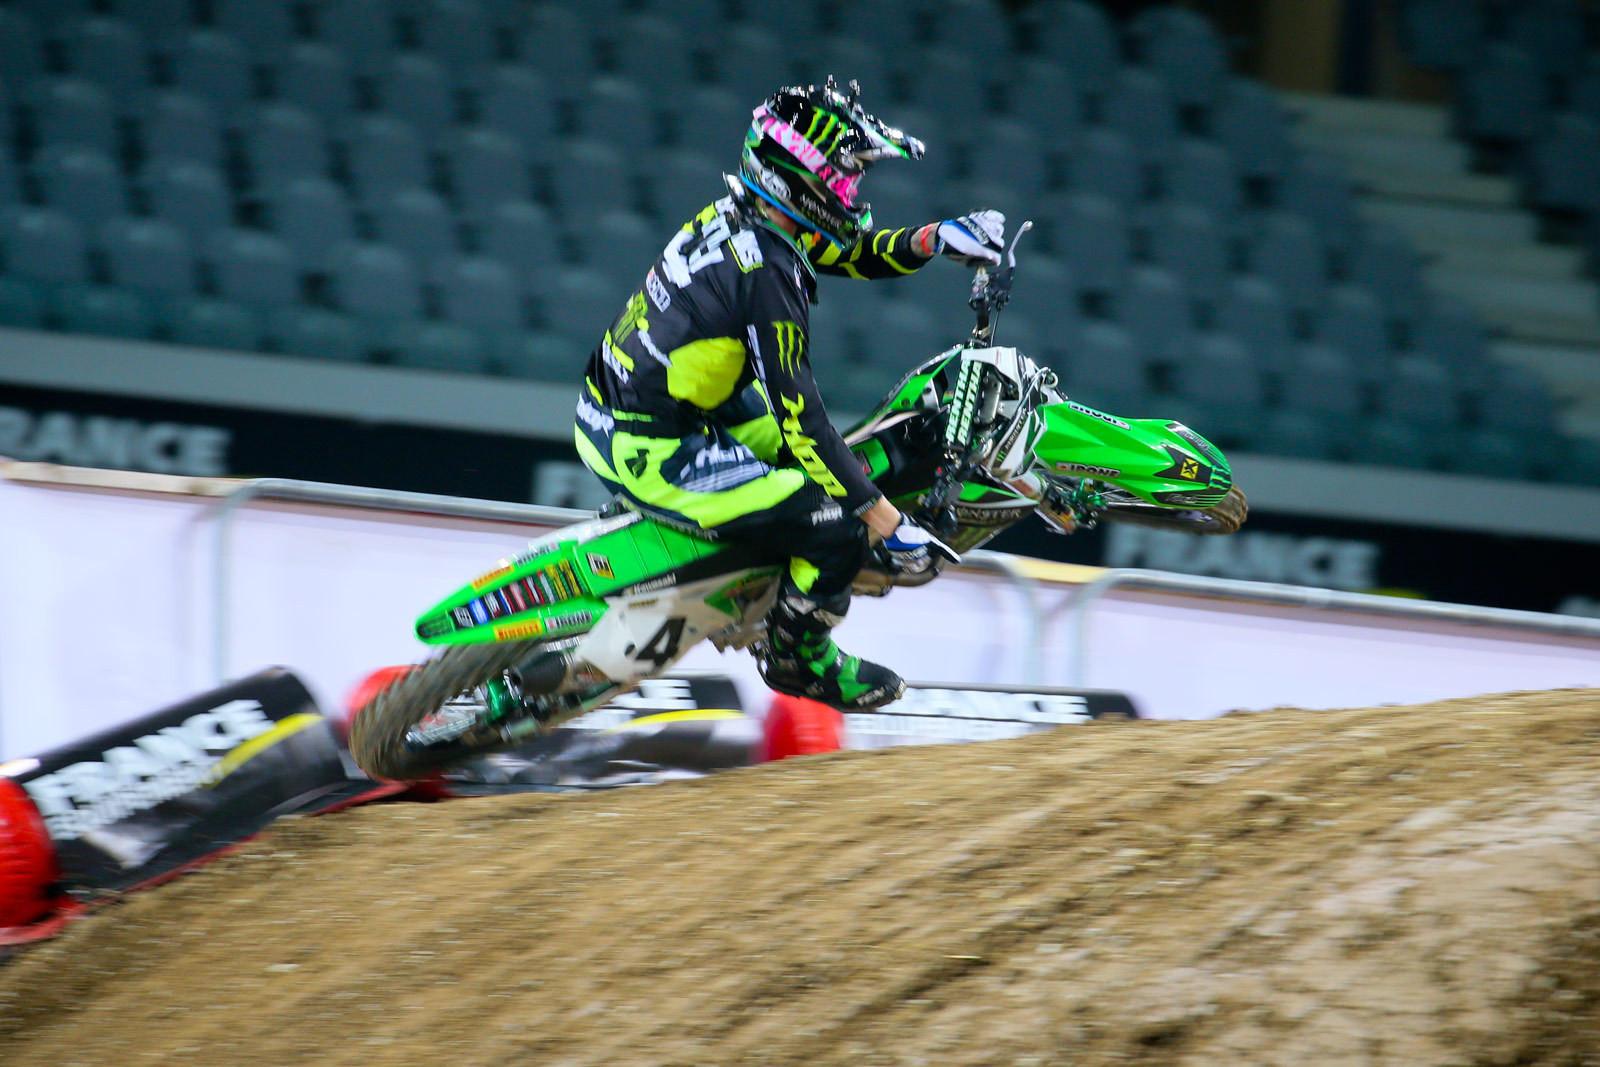 Dylan Ferrandis - Supercross Paris-Lille: Press Day - Motocross Pictures - Vital MX